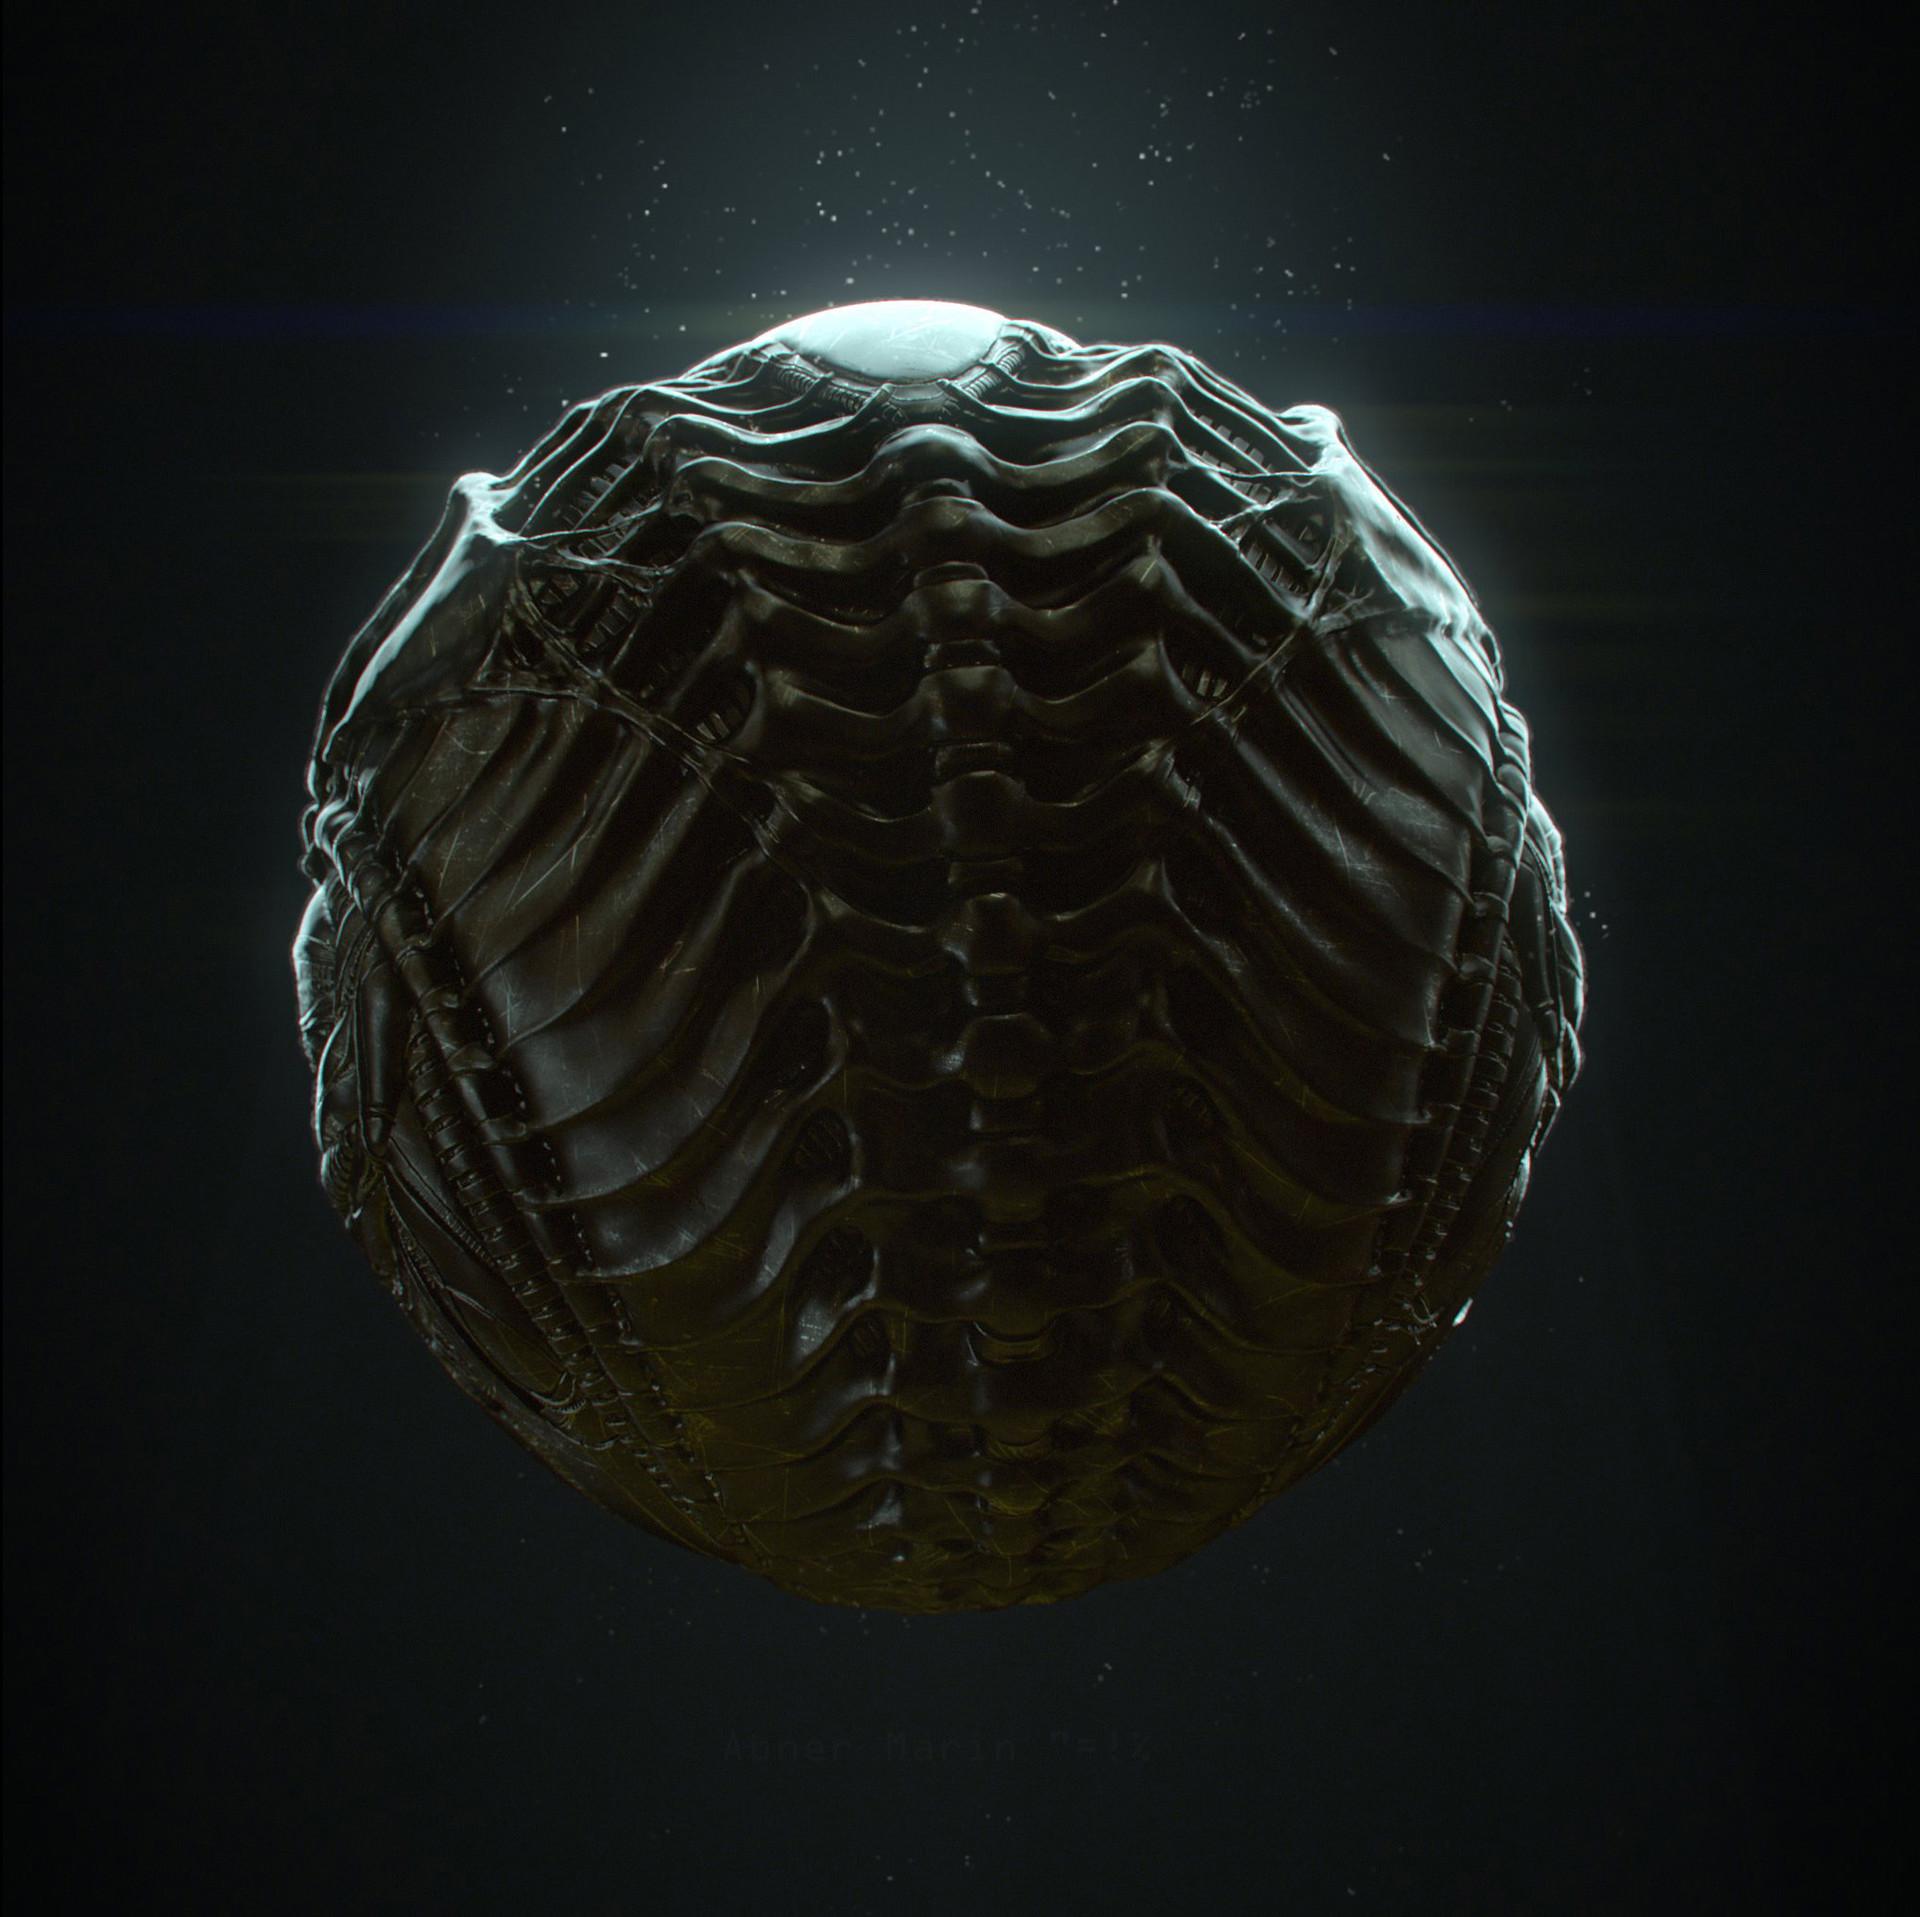 Abner marin alienartifact back